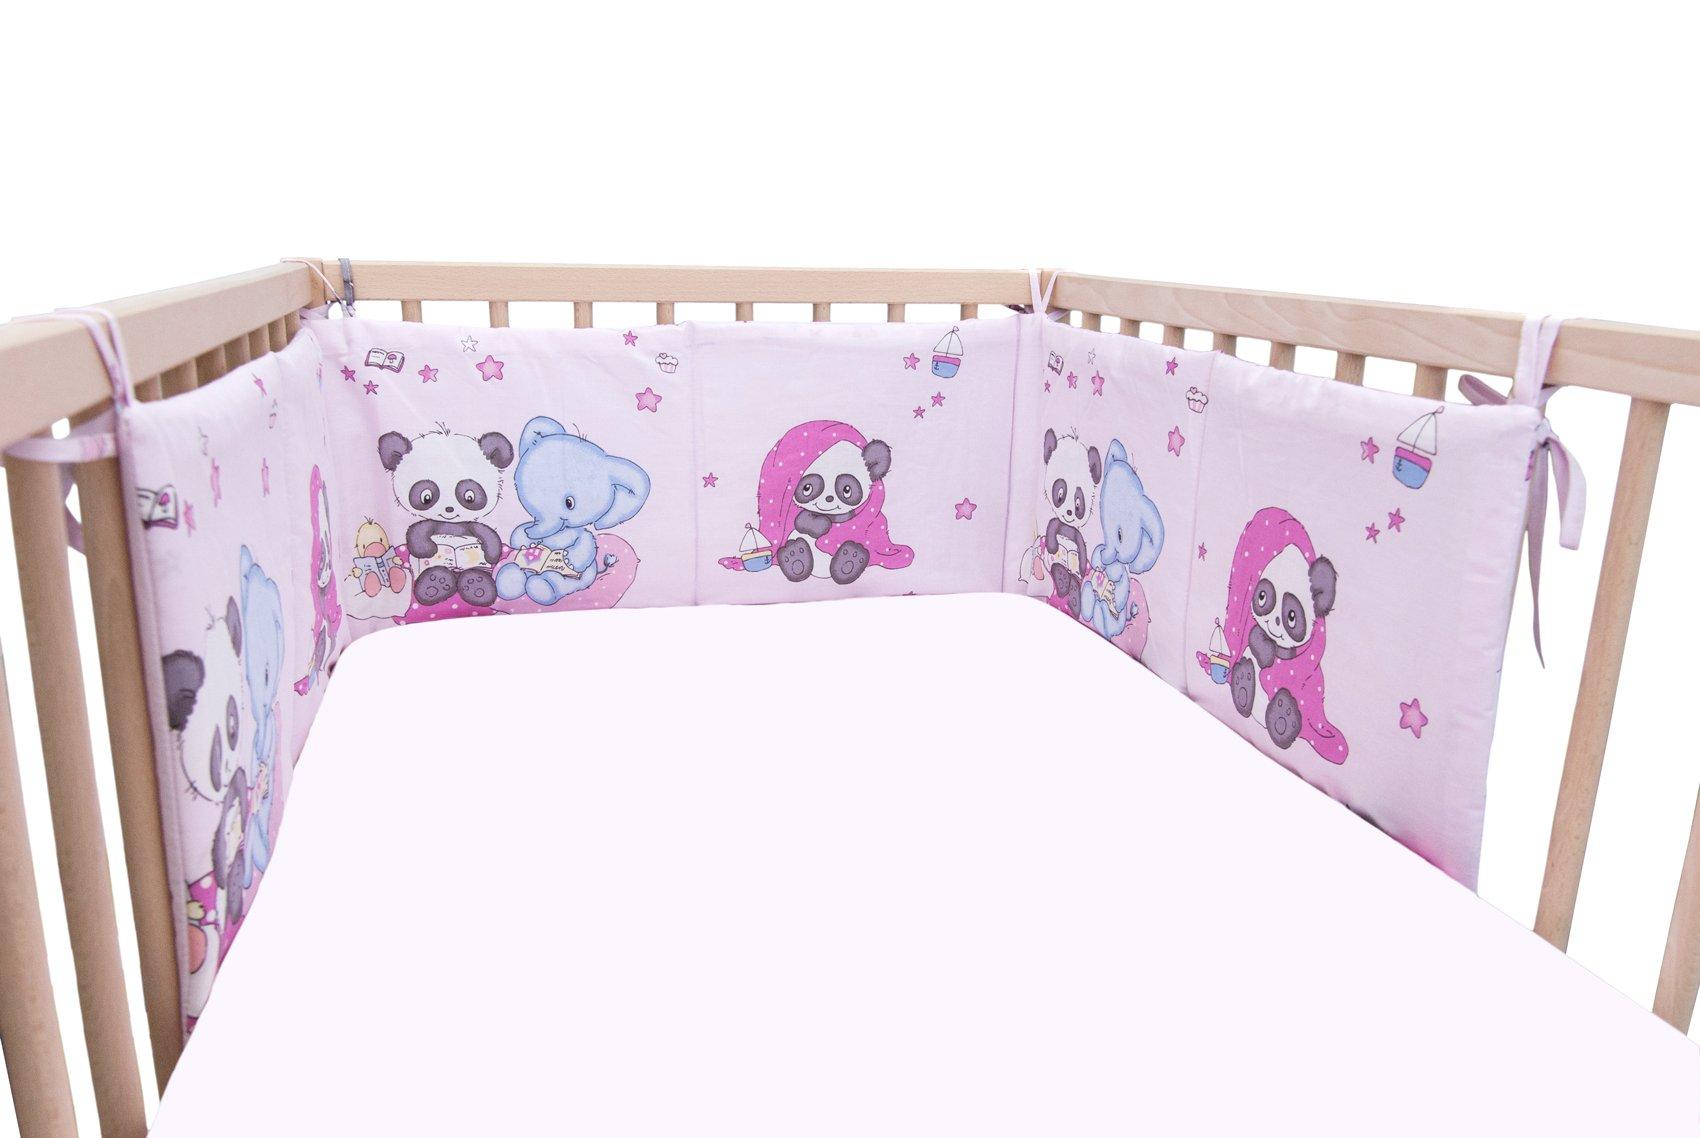 Baby Panda & Friends / SoulBedroom Cotton Cot Bumper Pad Half (210x40 cm)